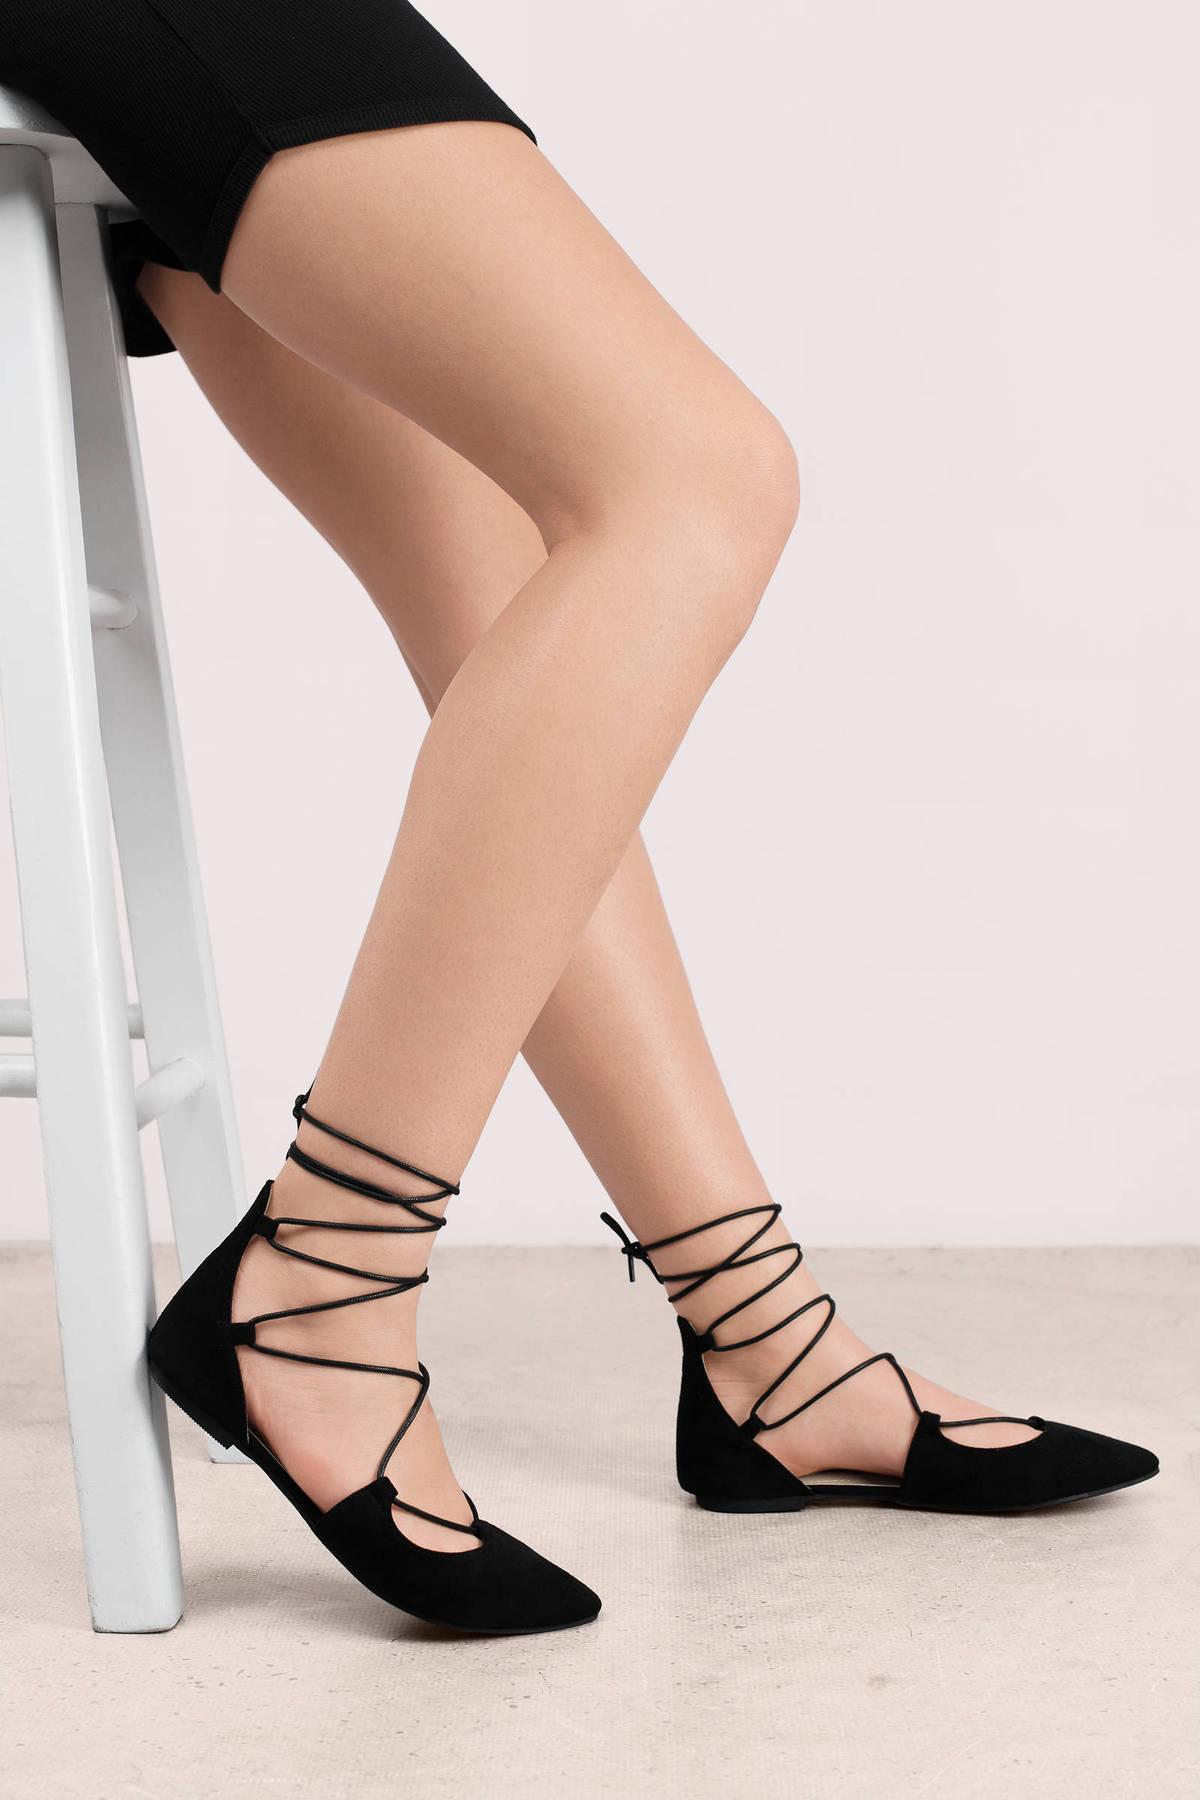 black-abela-suede-lace-up-flats@2x.jpg